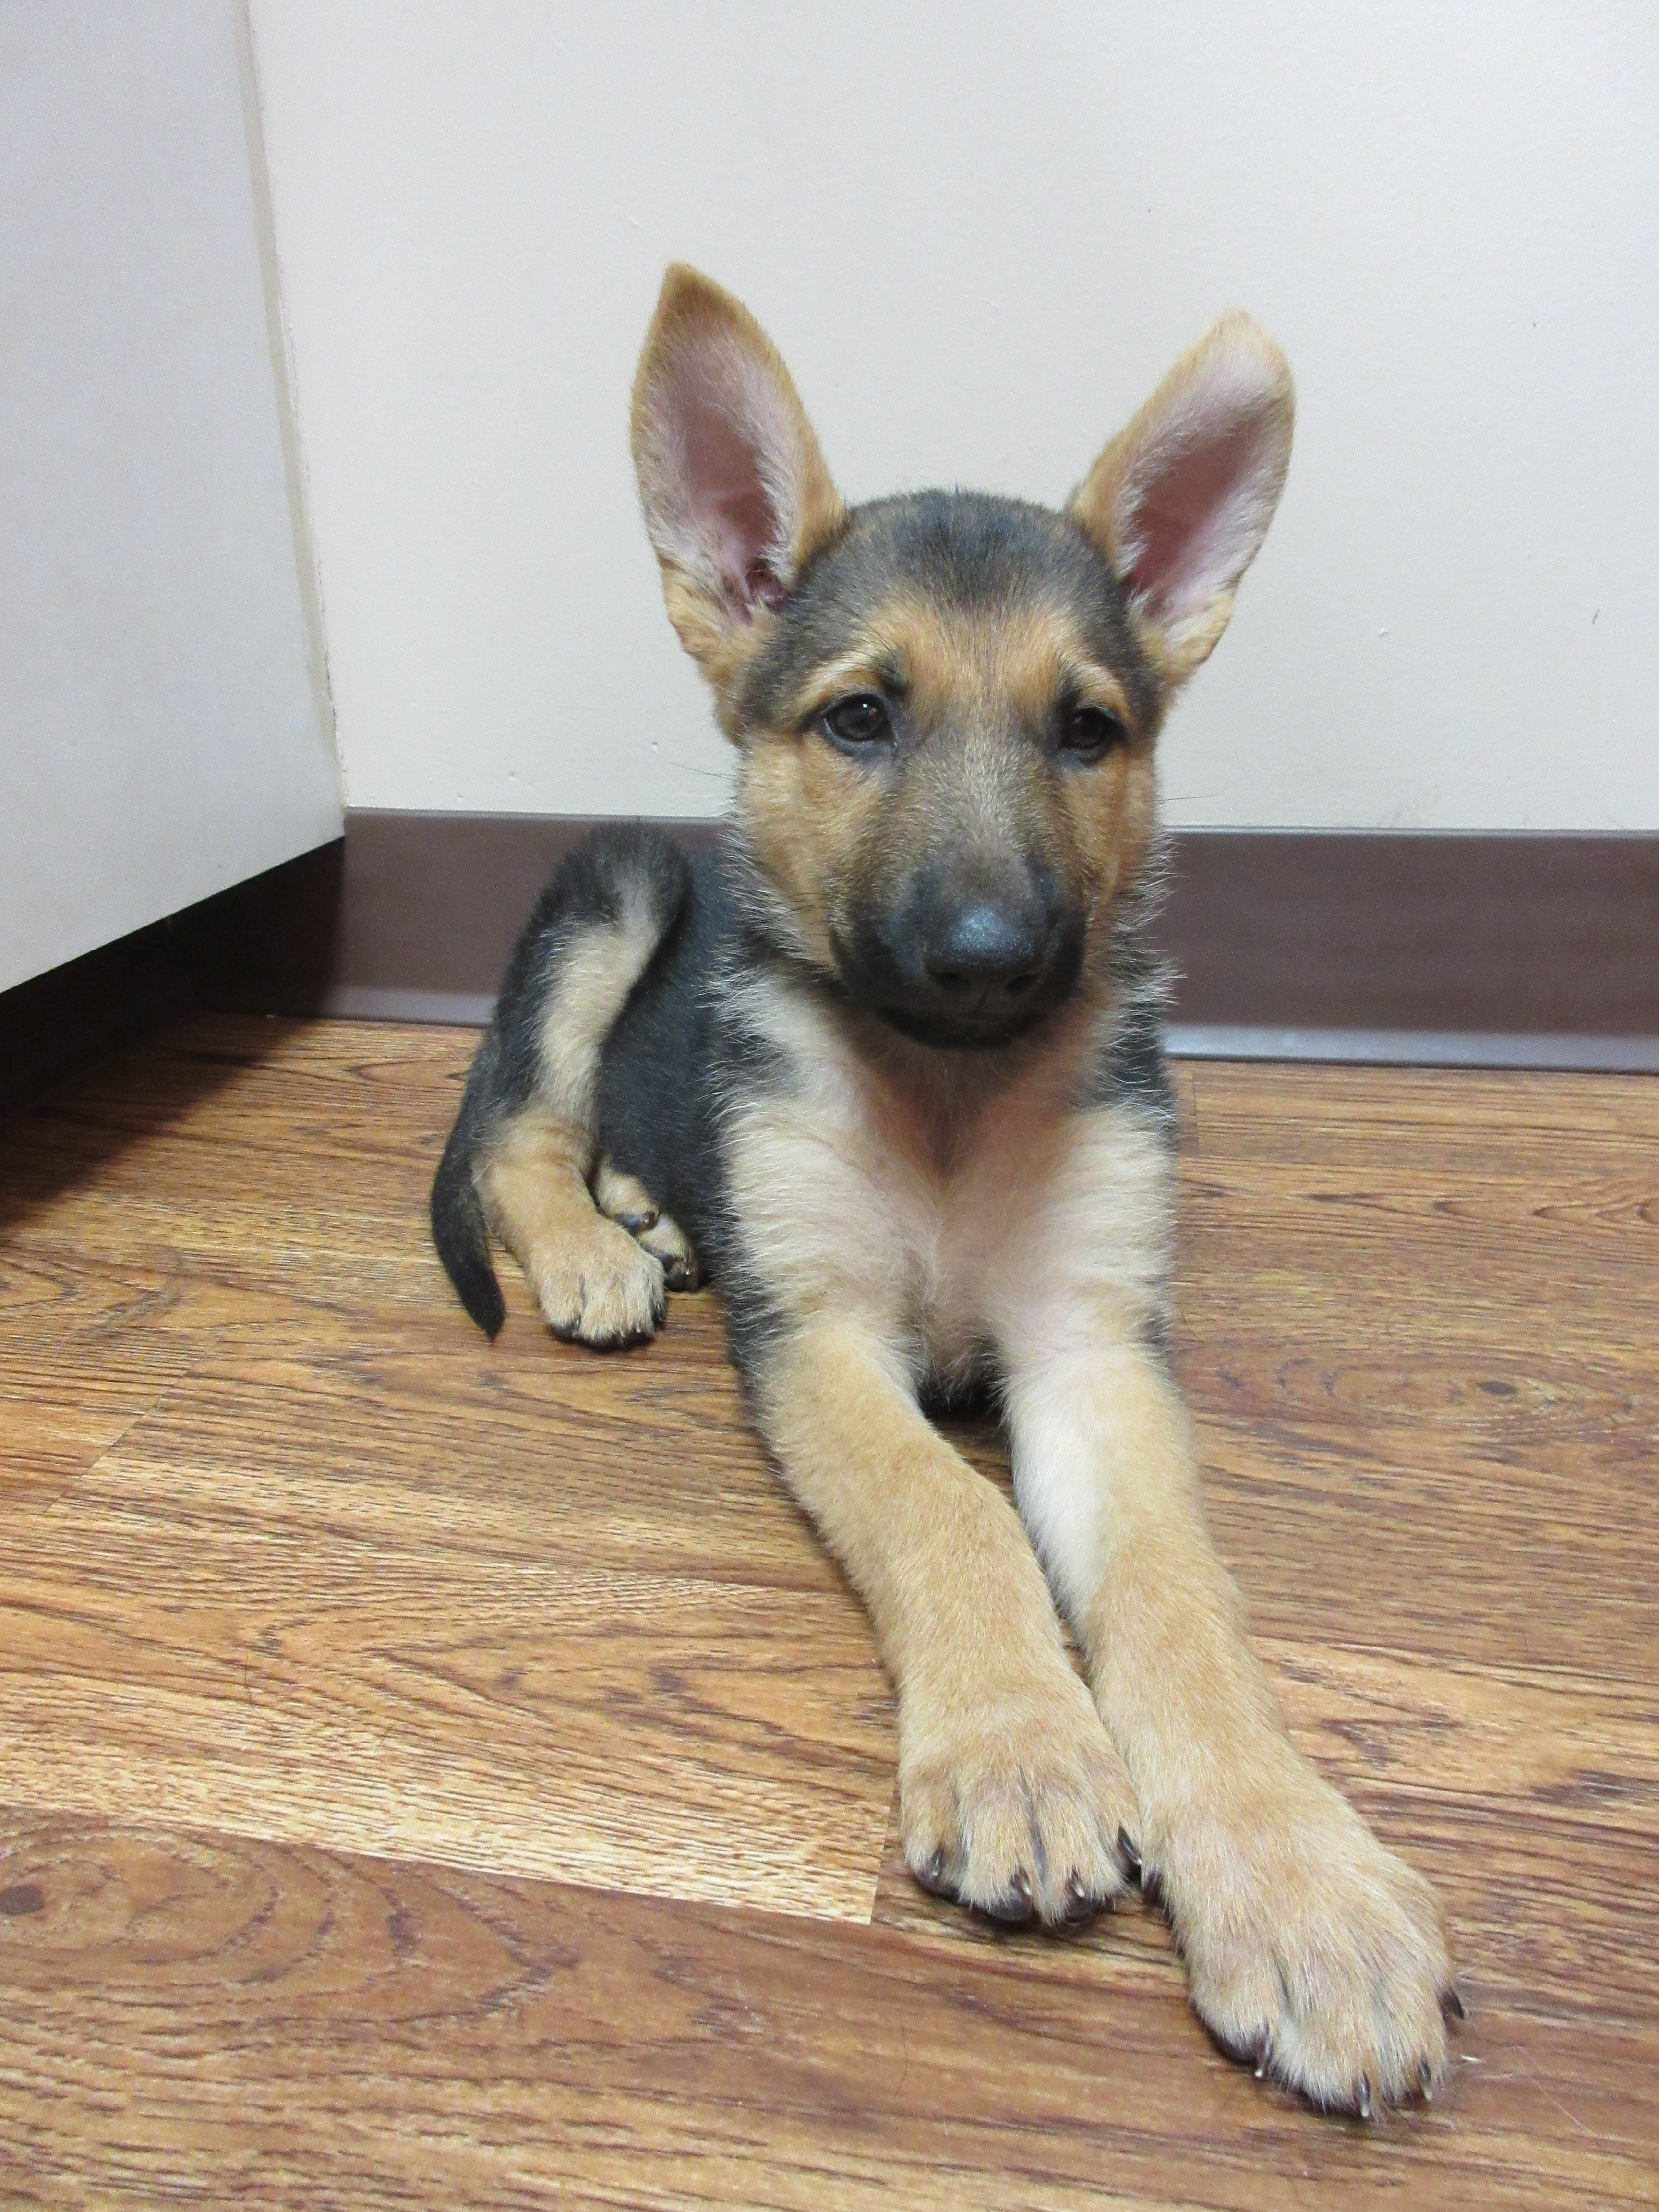 Lexi Is An 8 Week Old German Shepherd Pet Care Dogs Funny Dogs